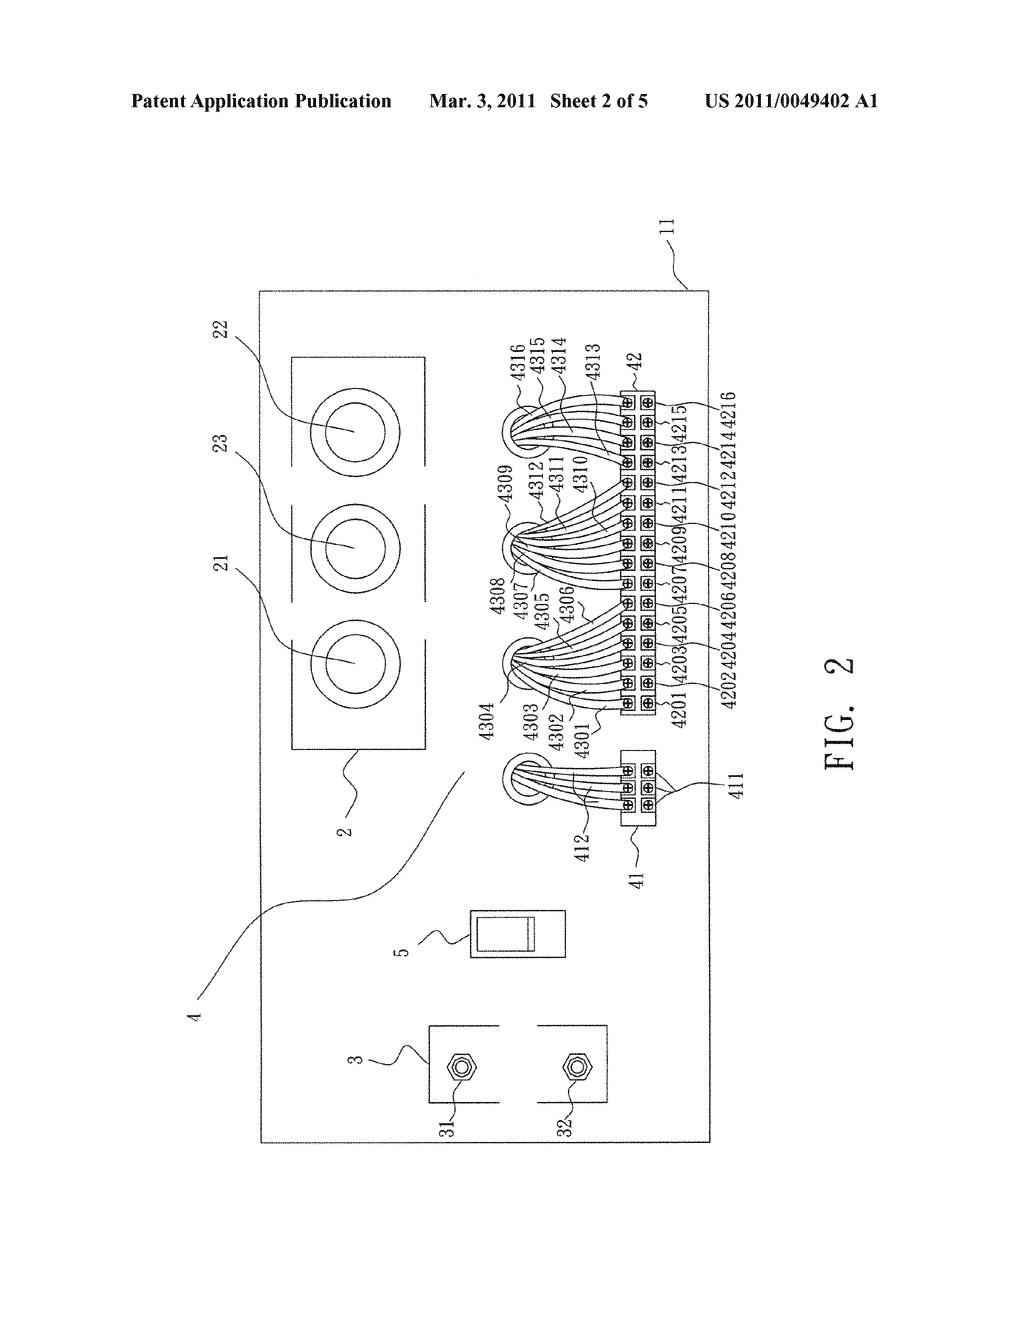 Motorised Valve Wiring